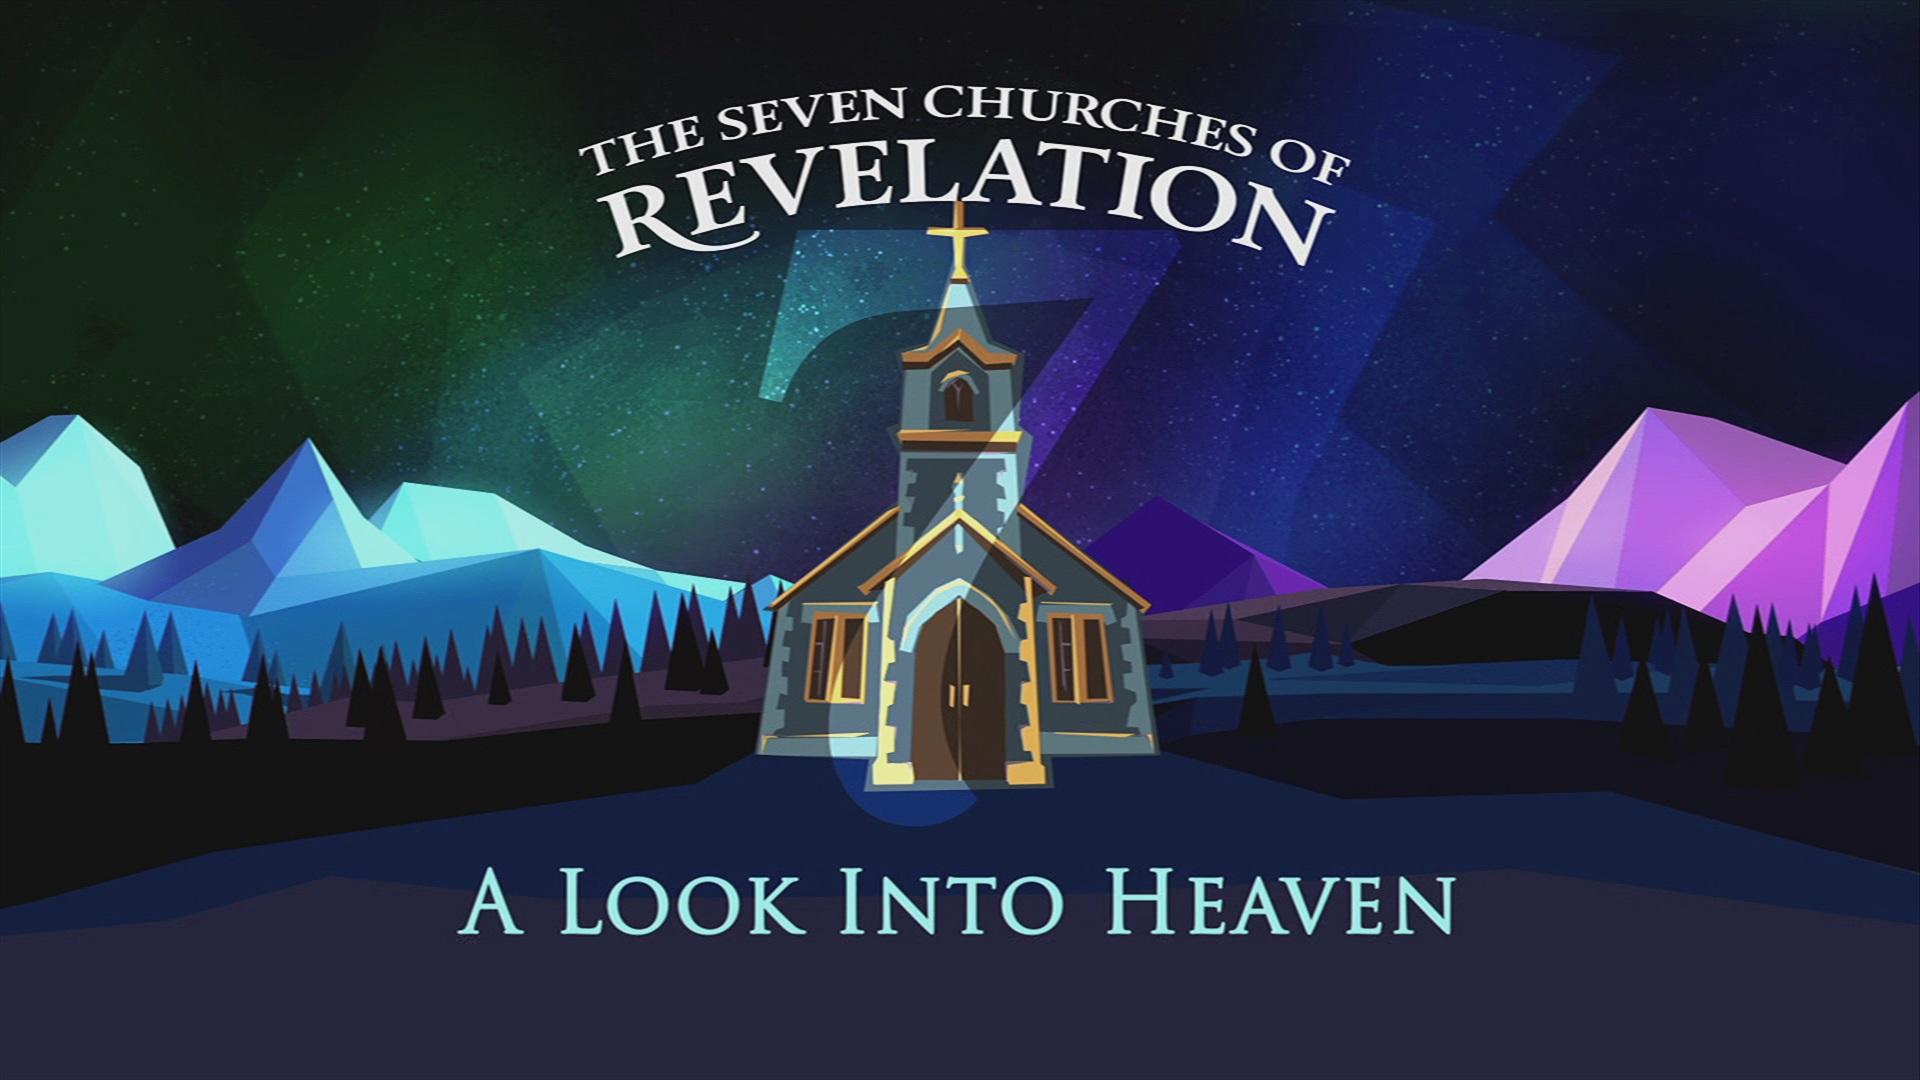 A Look Into Heaven